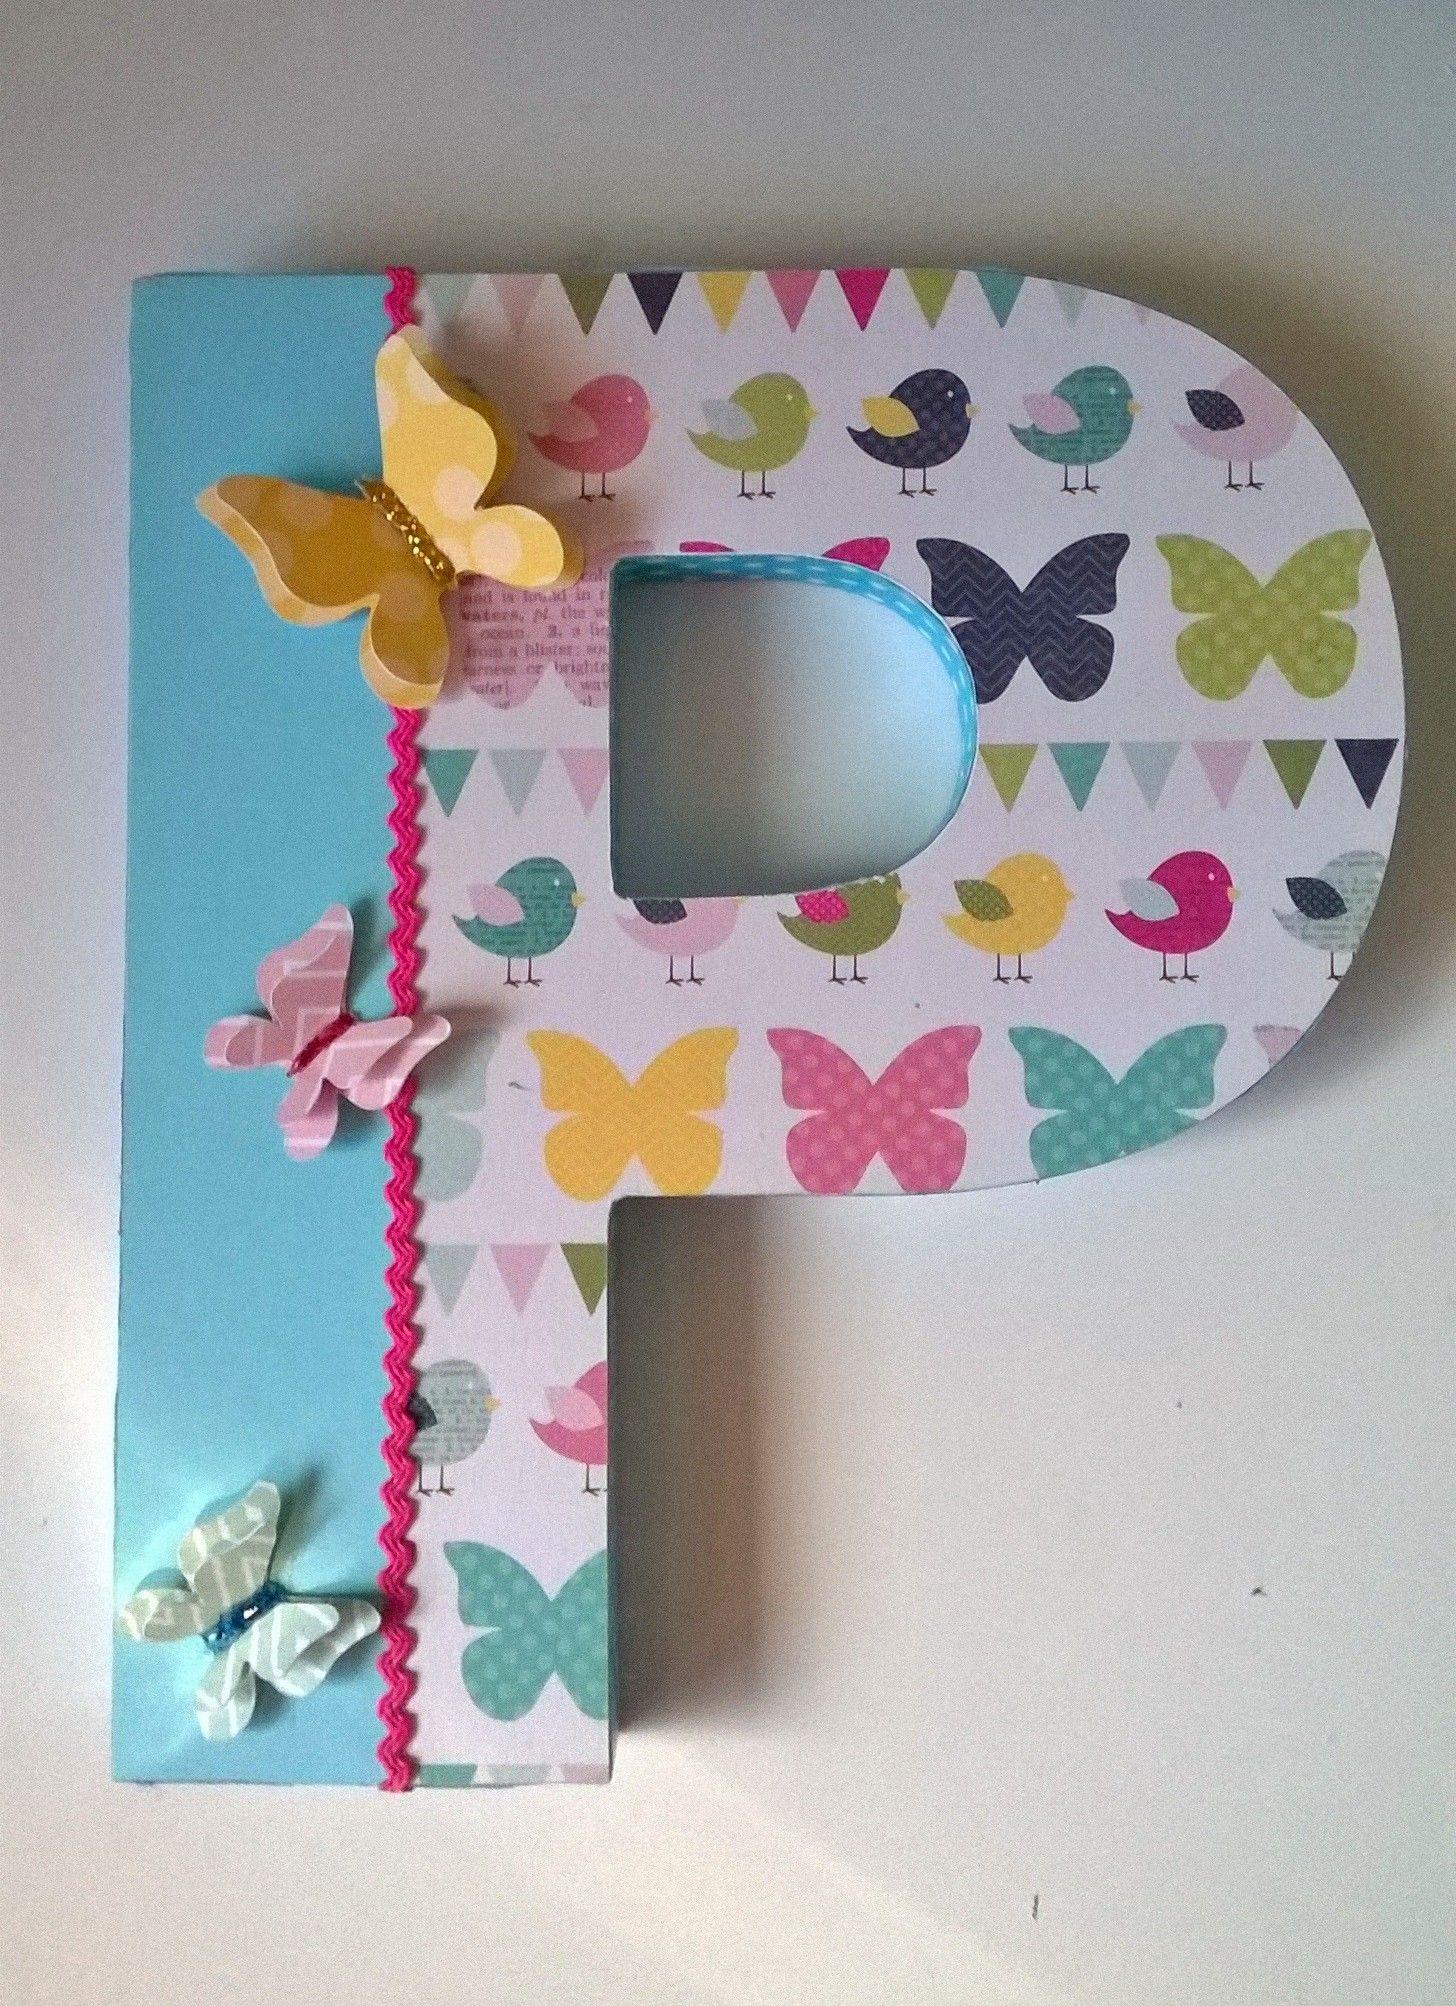 Letras decoradas altered letter scrapbook scrap letras letters pinterest scrap - Letras decoradas scrap ...